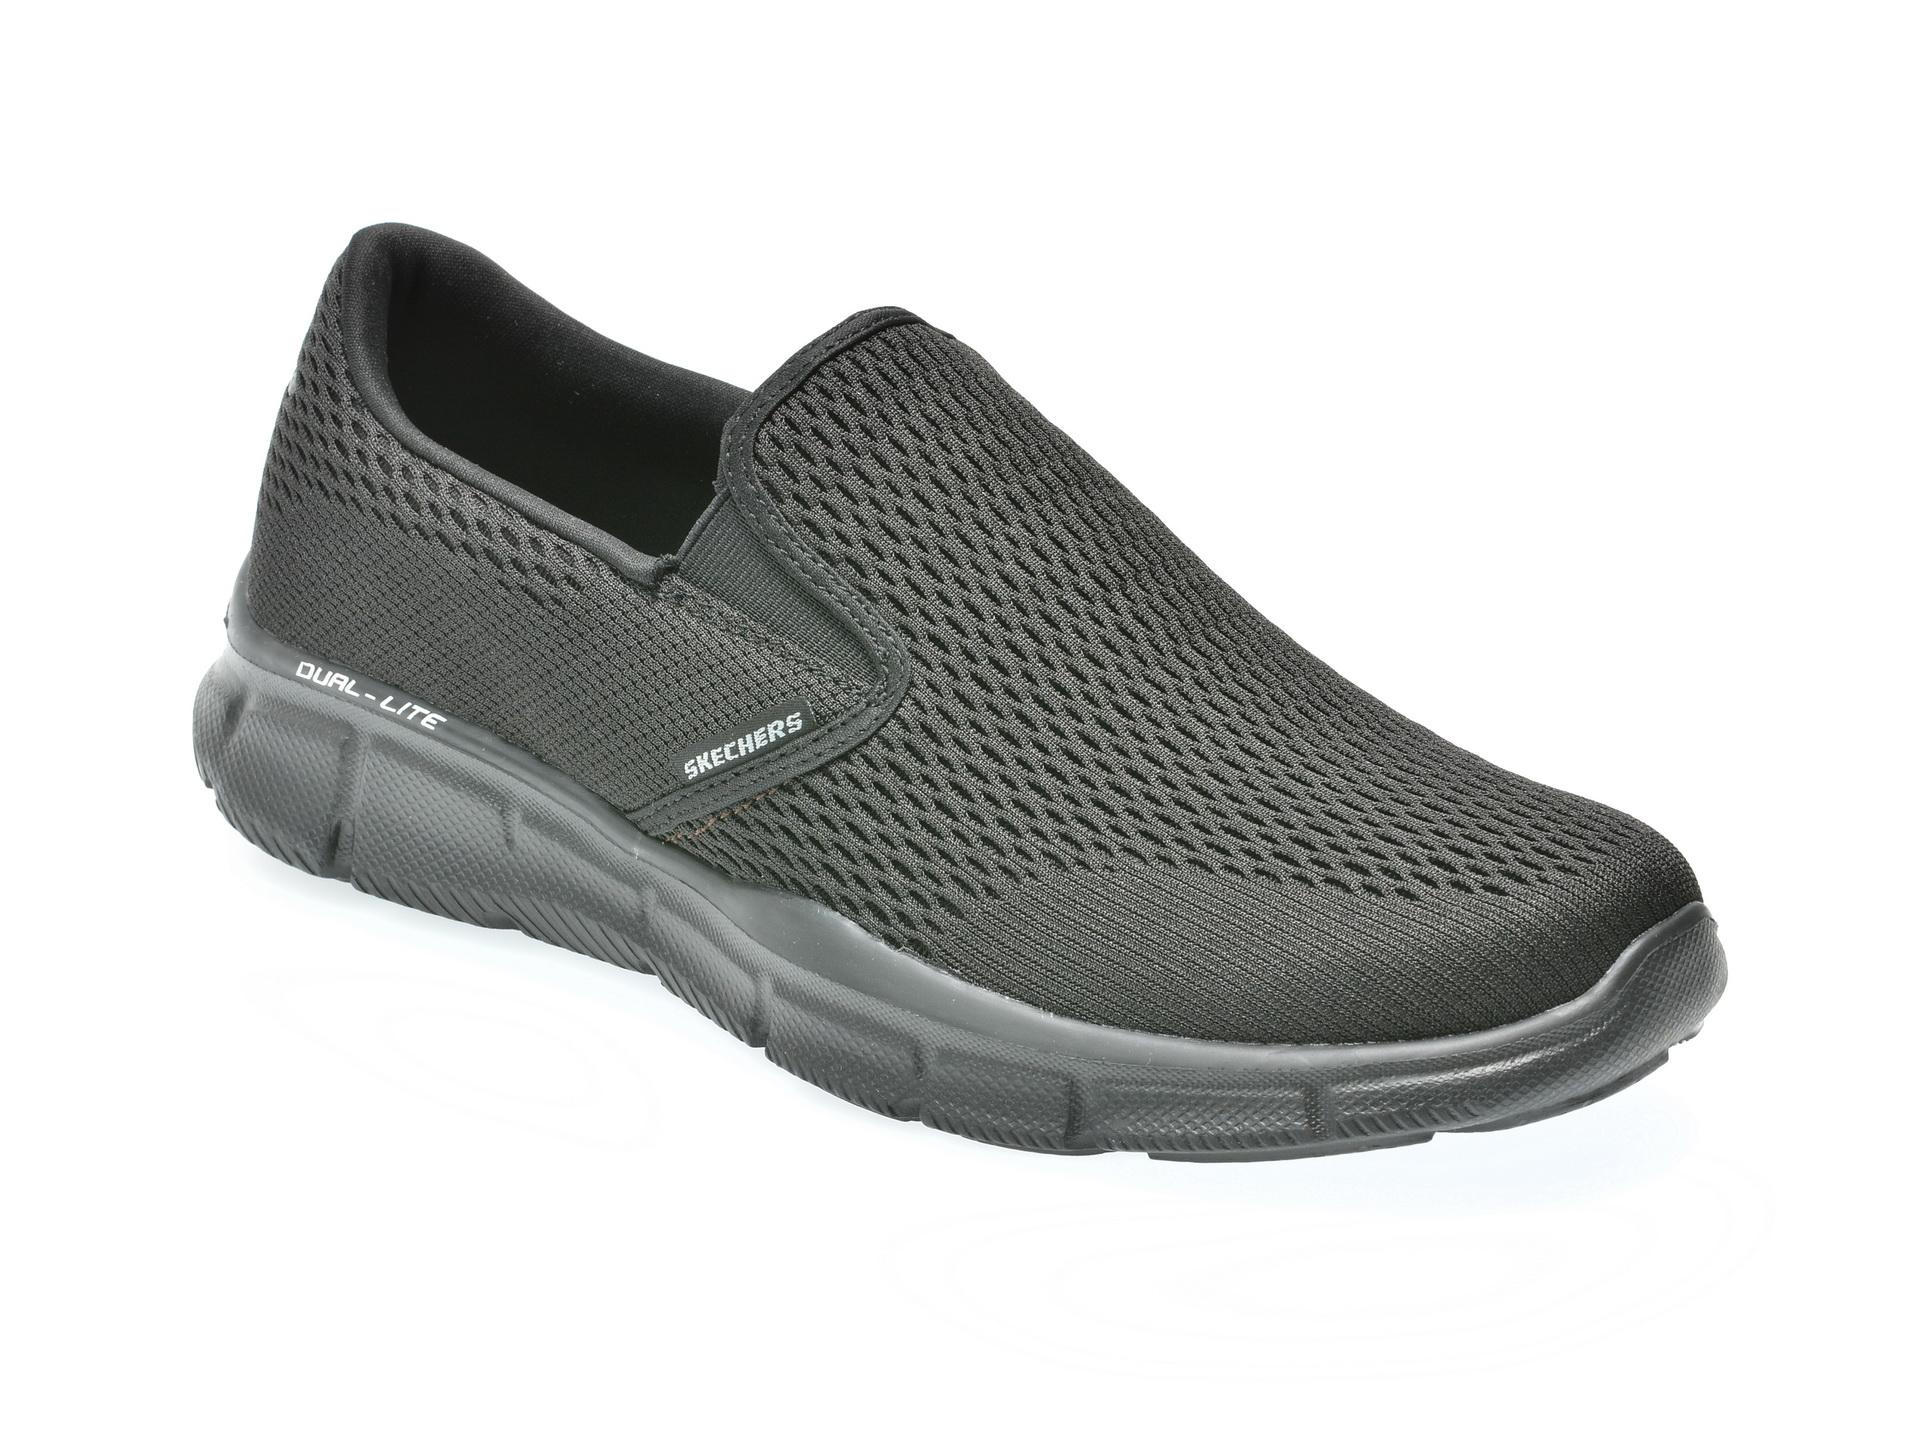 Pantofi sport SKECHERS negri, 51509, din piele ecologica